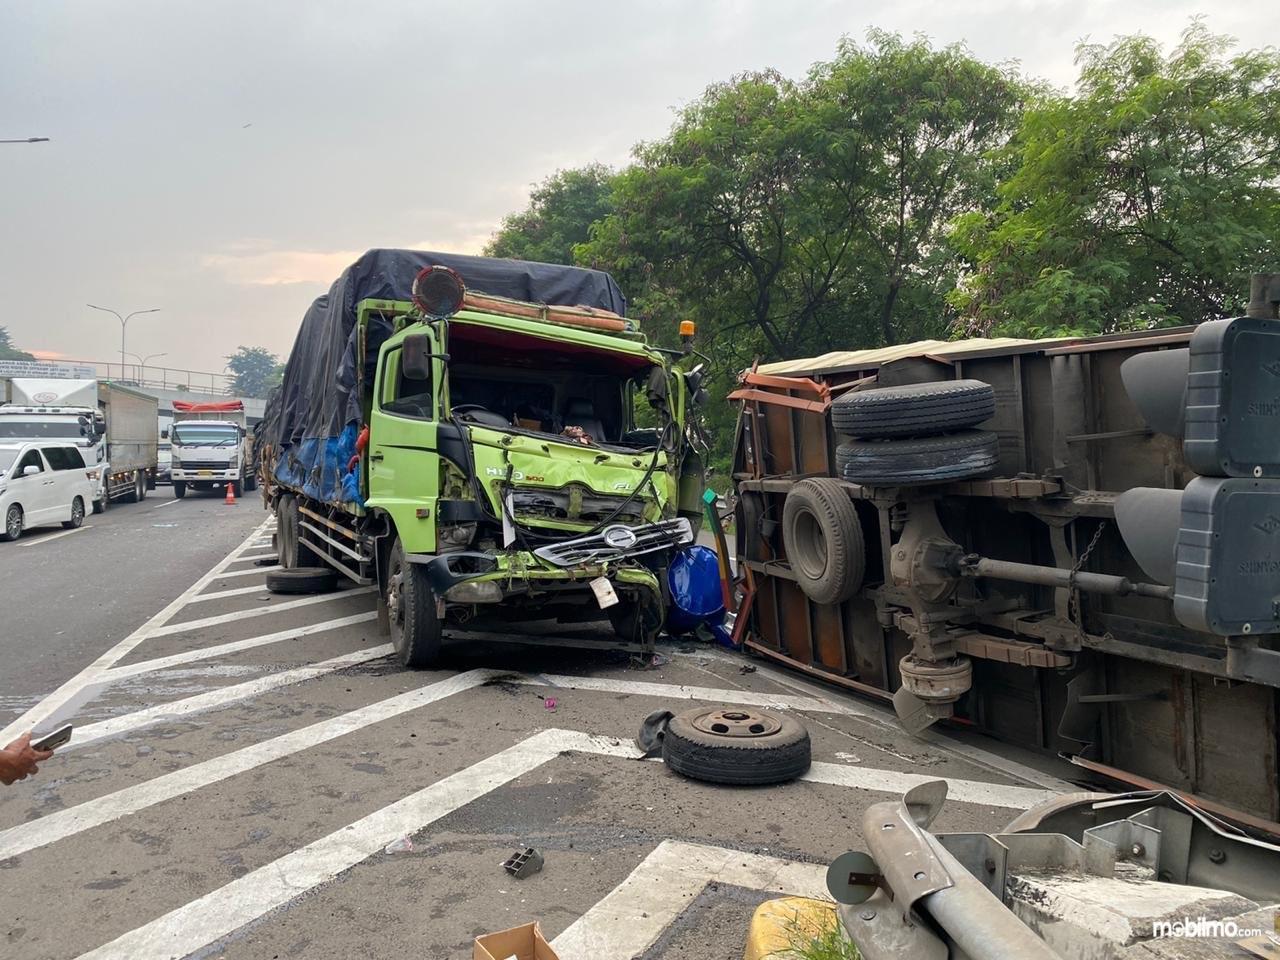 Foto menunjukkan Kecelakaan 2 Truk di Tol JORR Exit Taman Mini (Jati Asih ke Lebak Bulus) pada 18 Maret 2020